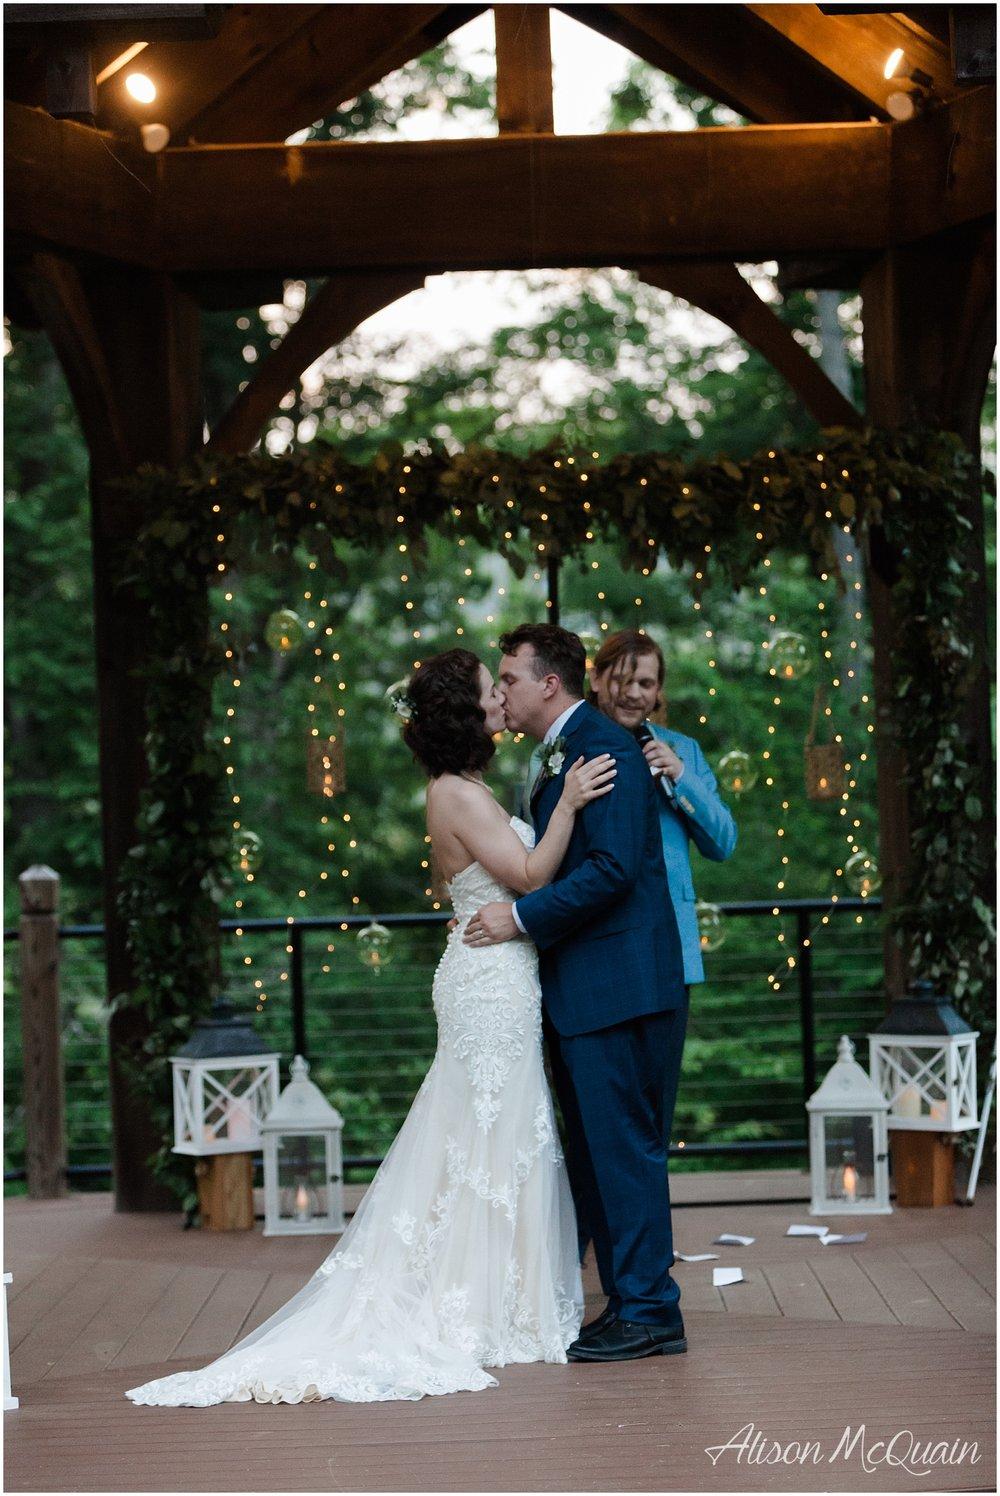 2018-05-23_0046LandC_wedding_dancingbearlodge_townsend_tn_amp.jpg